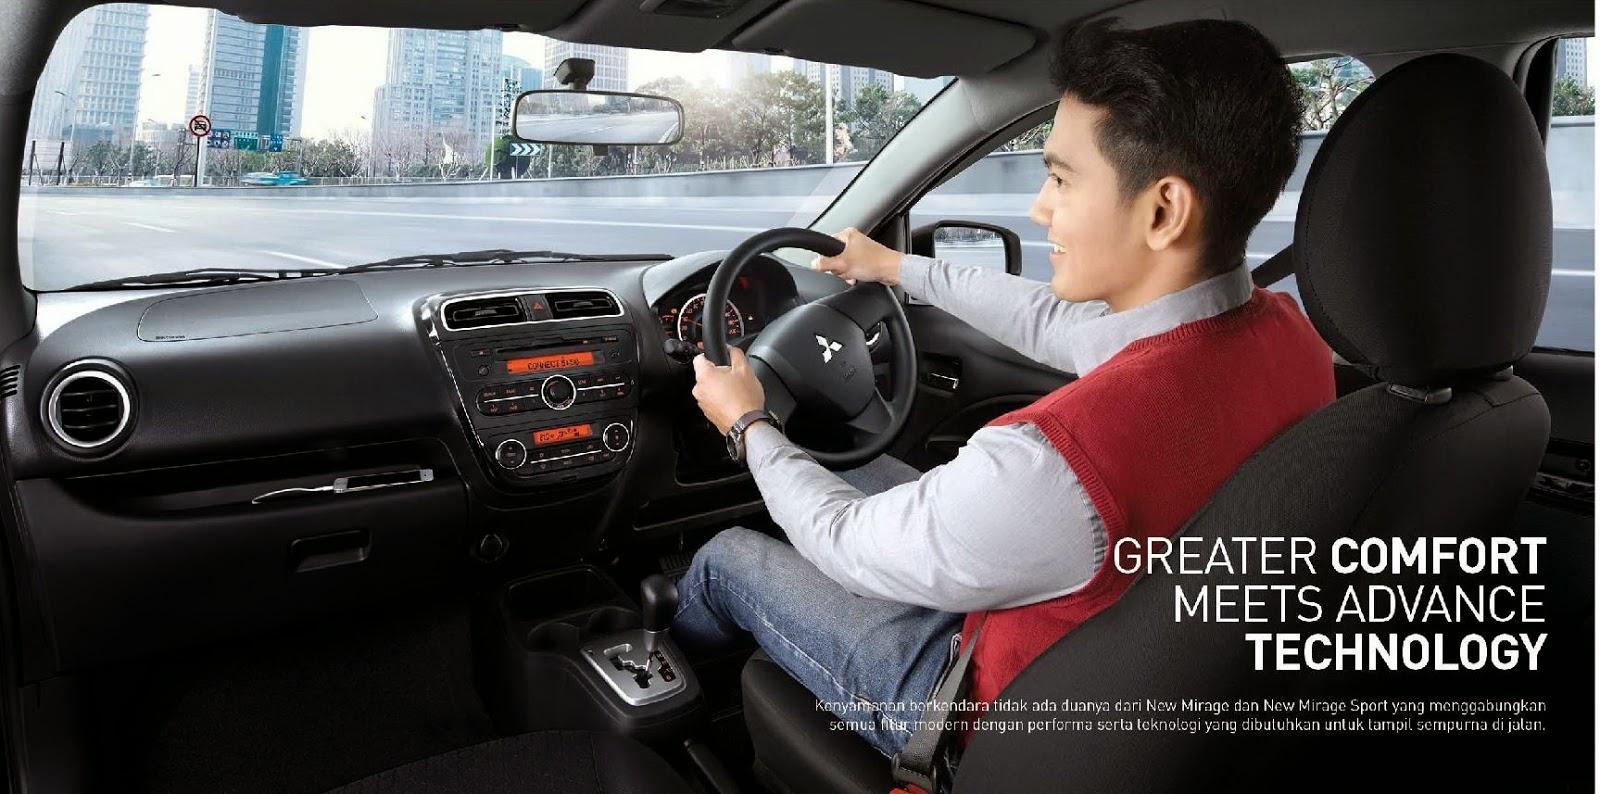 Brosur Mobil Mitsubishi New Mirage Sport 2015